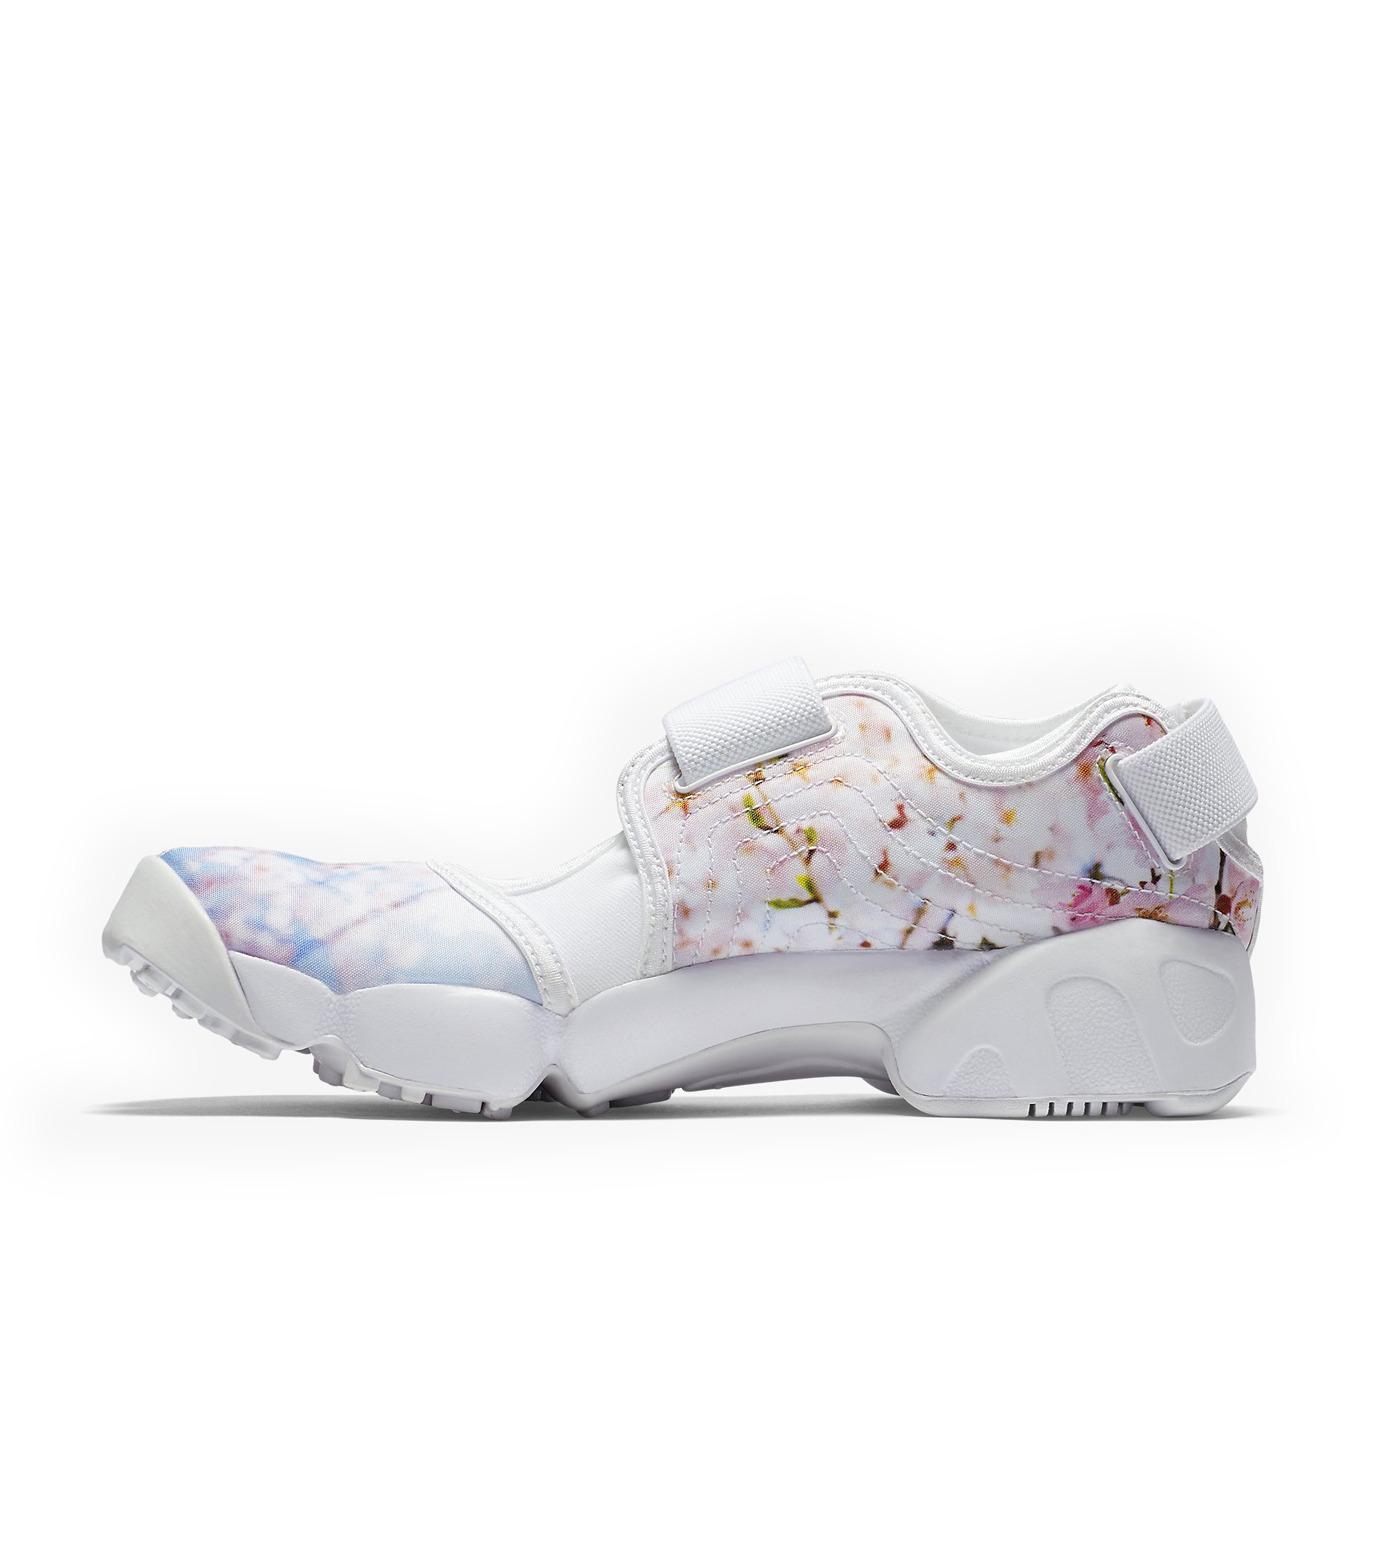 NIKE(ナイキ)のAIR RIFT PRINT-WHITE(シューズ/shoes)-807398-101-4 拡大詳細画像2